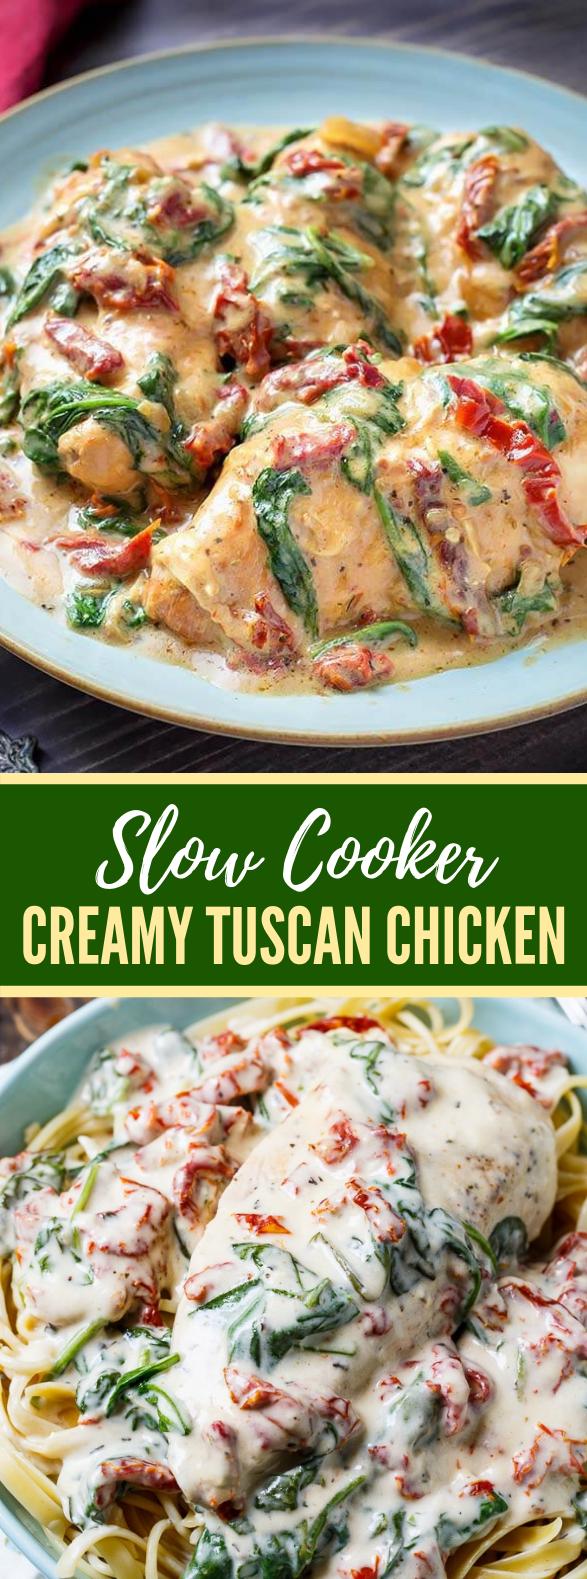 Slow Cooker Creamy Tuscan Chicken #dinner #crockpot